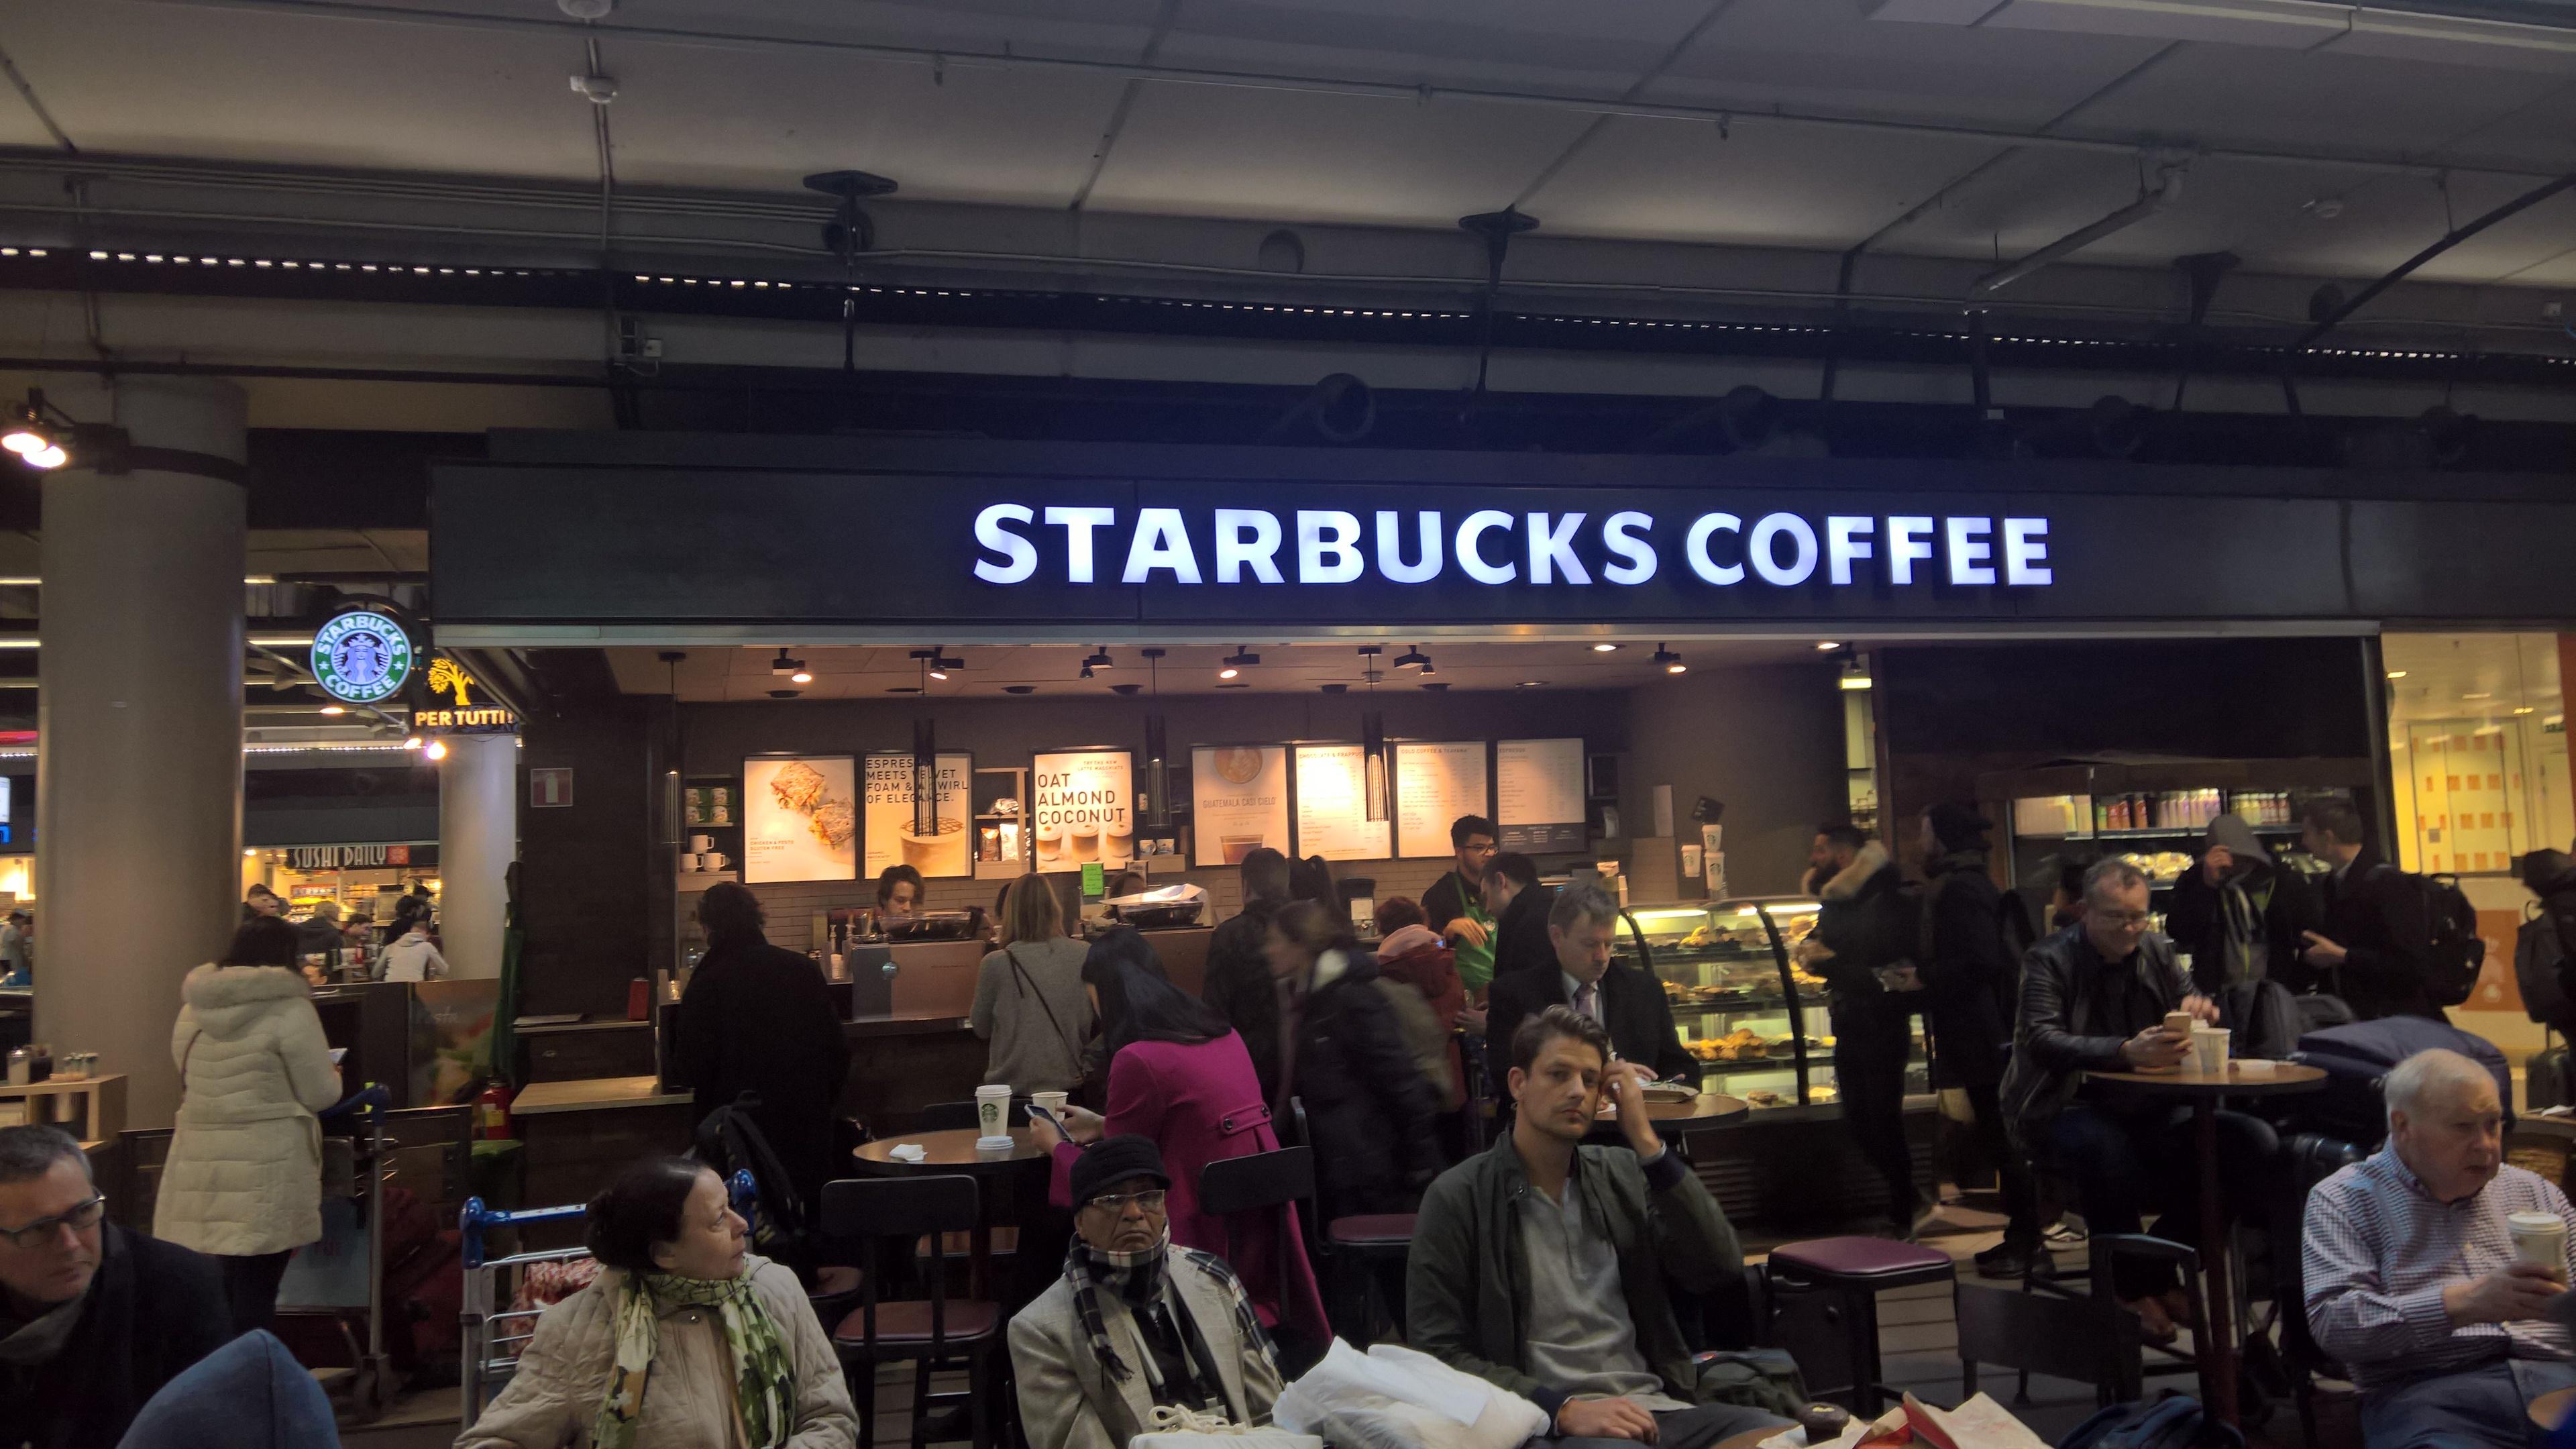 Design Per Tutti Com file:starbucks coffee groundfloor, schiphol (2018)